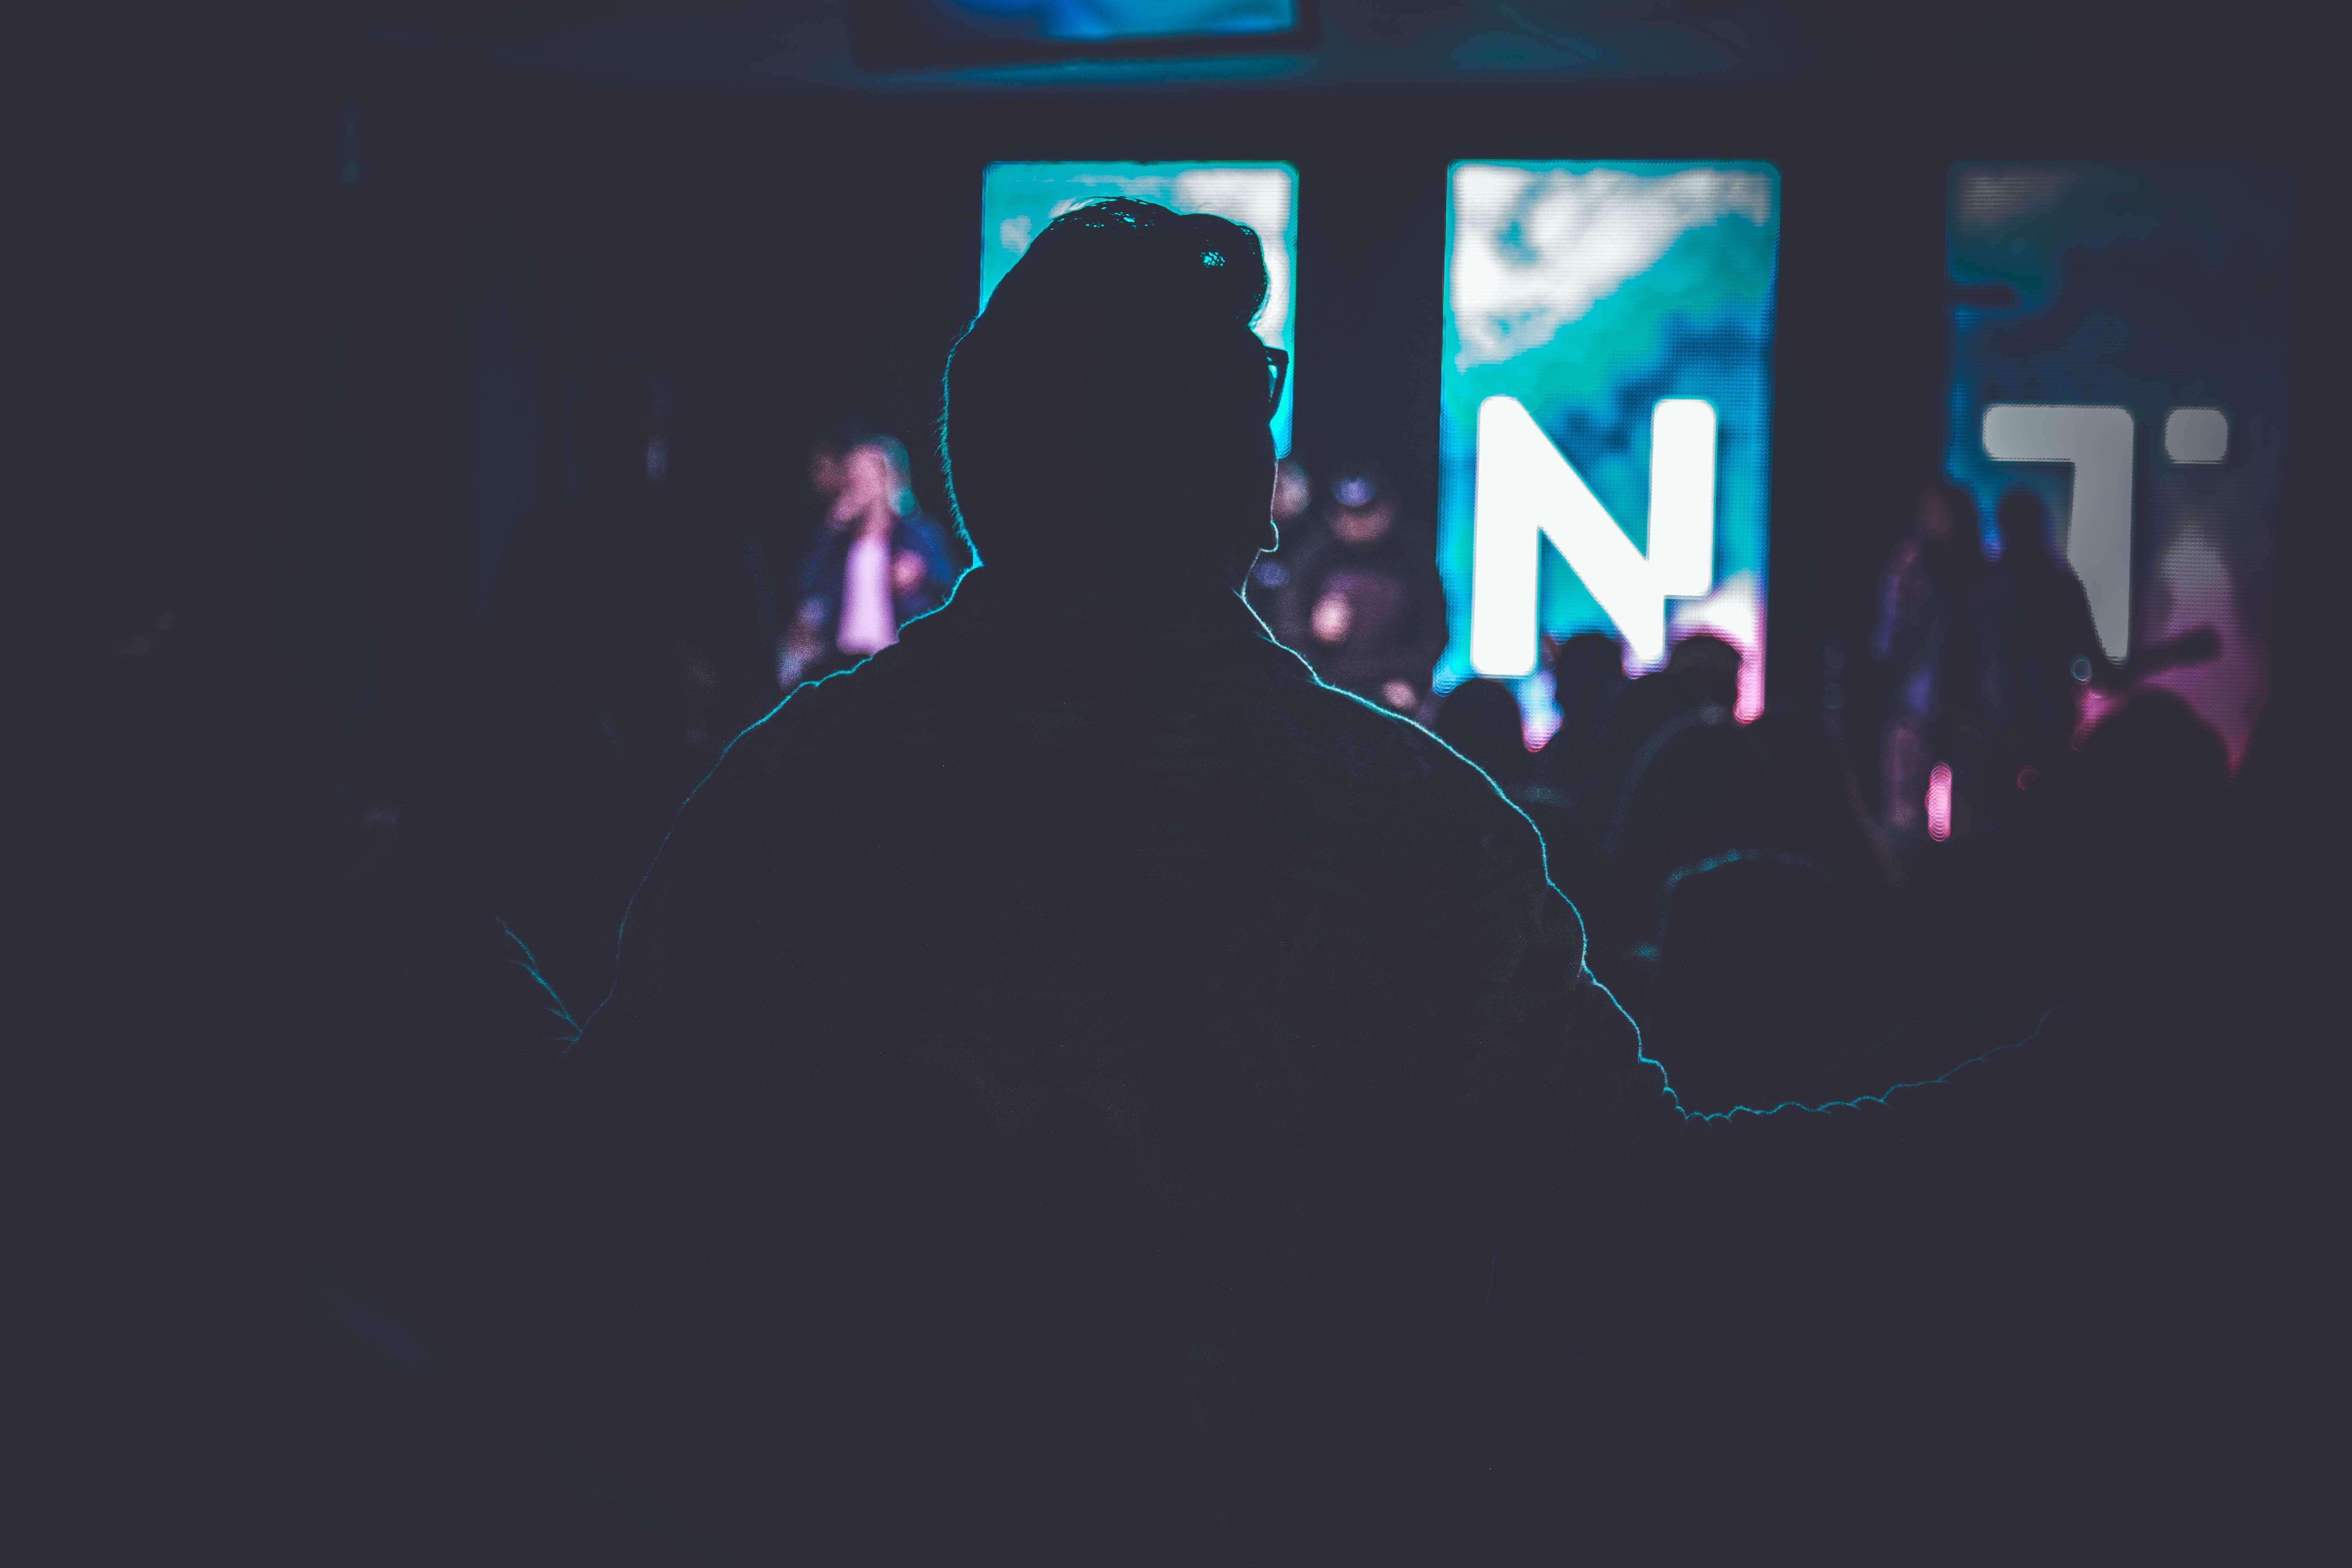 silhouette of people inside room